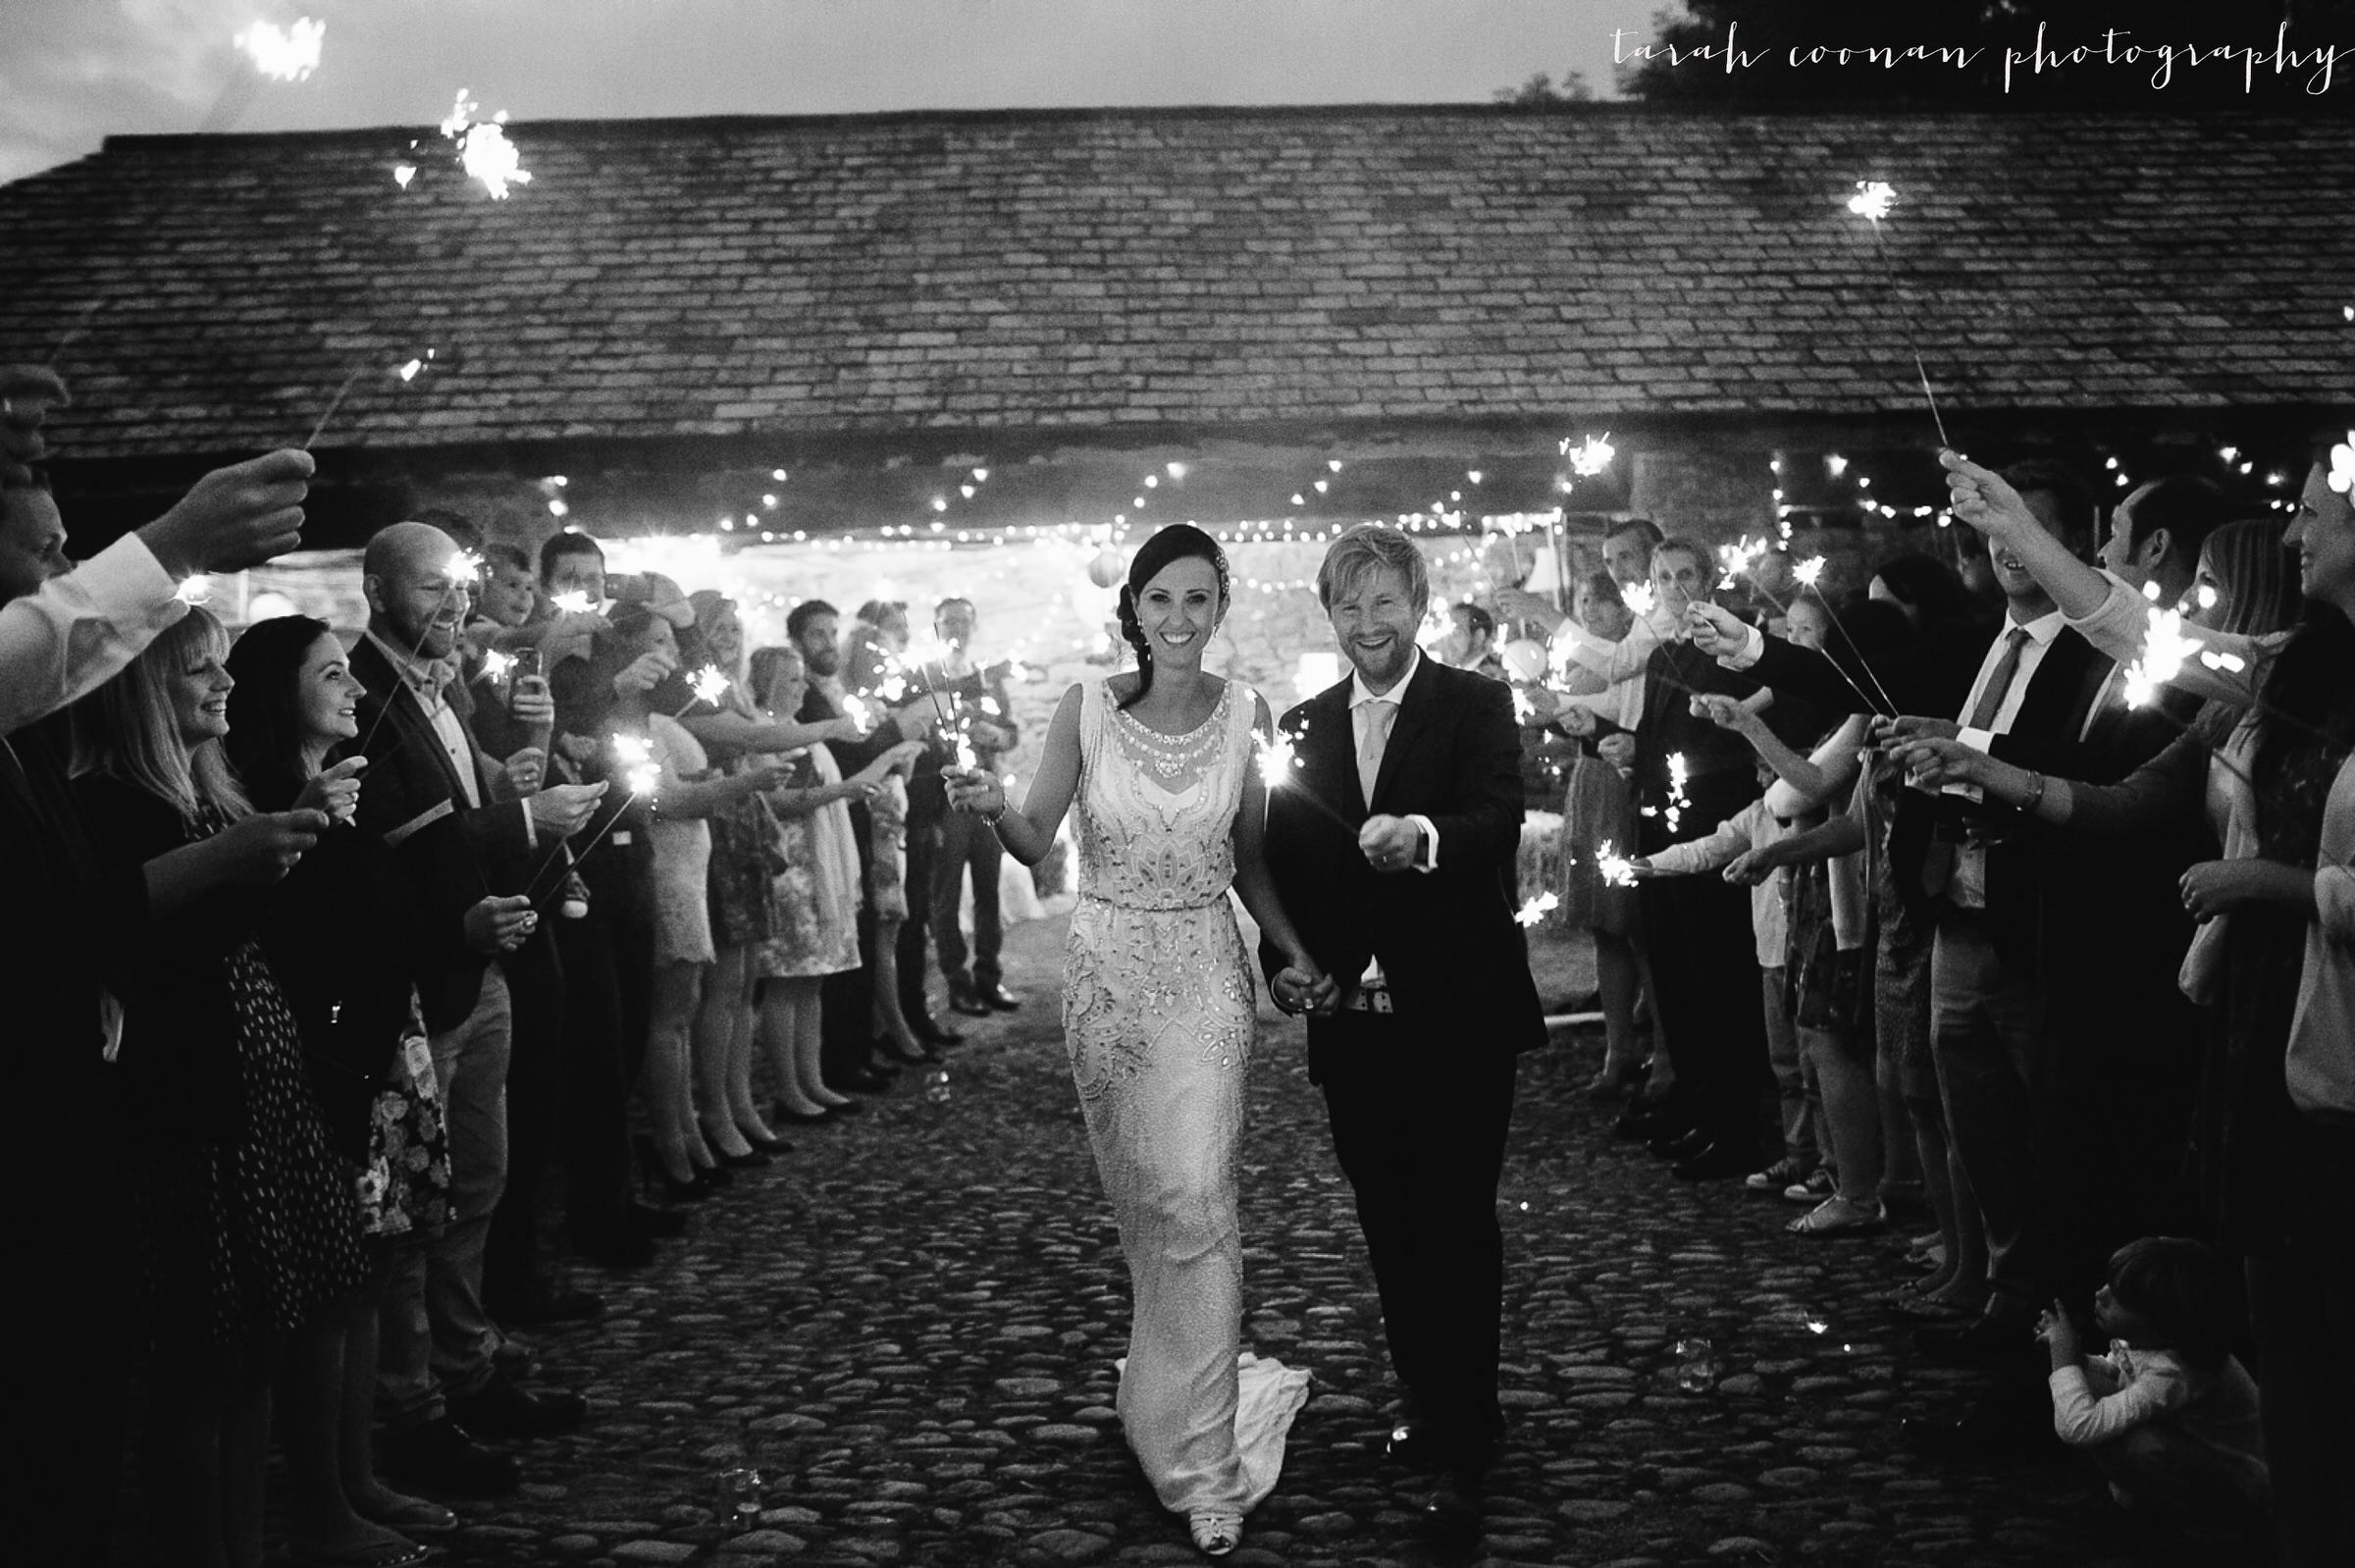 brighton-wedding-photographer125